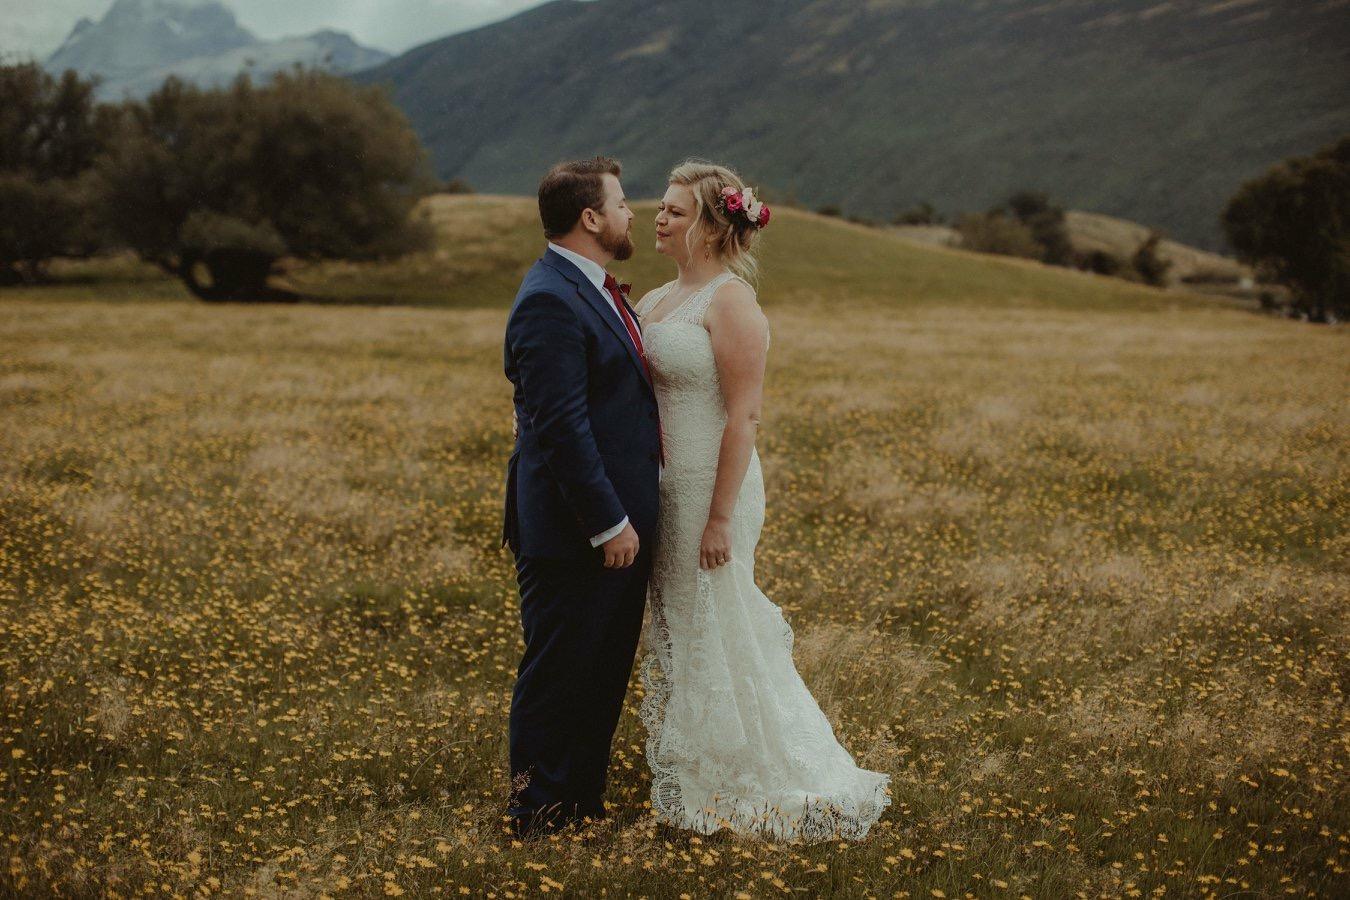 Romantic, modern wedding dresses